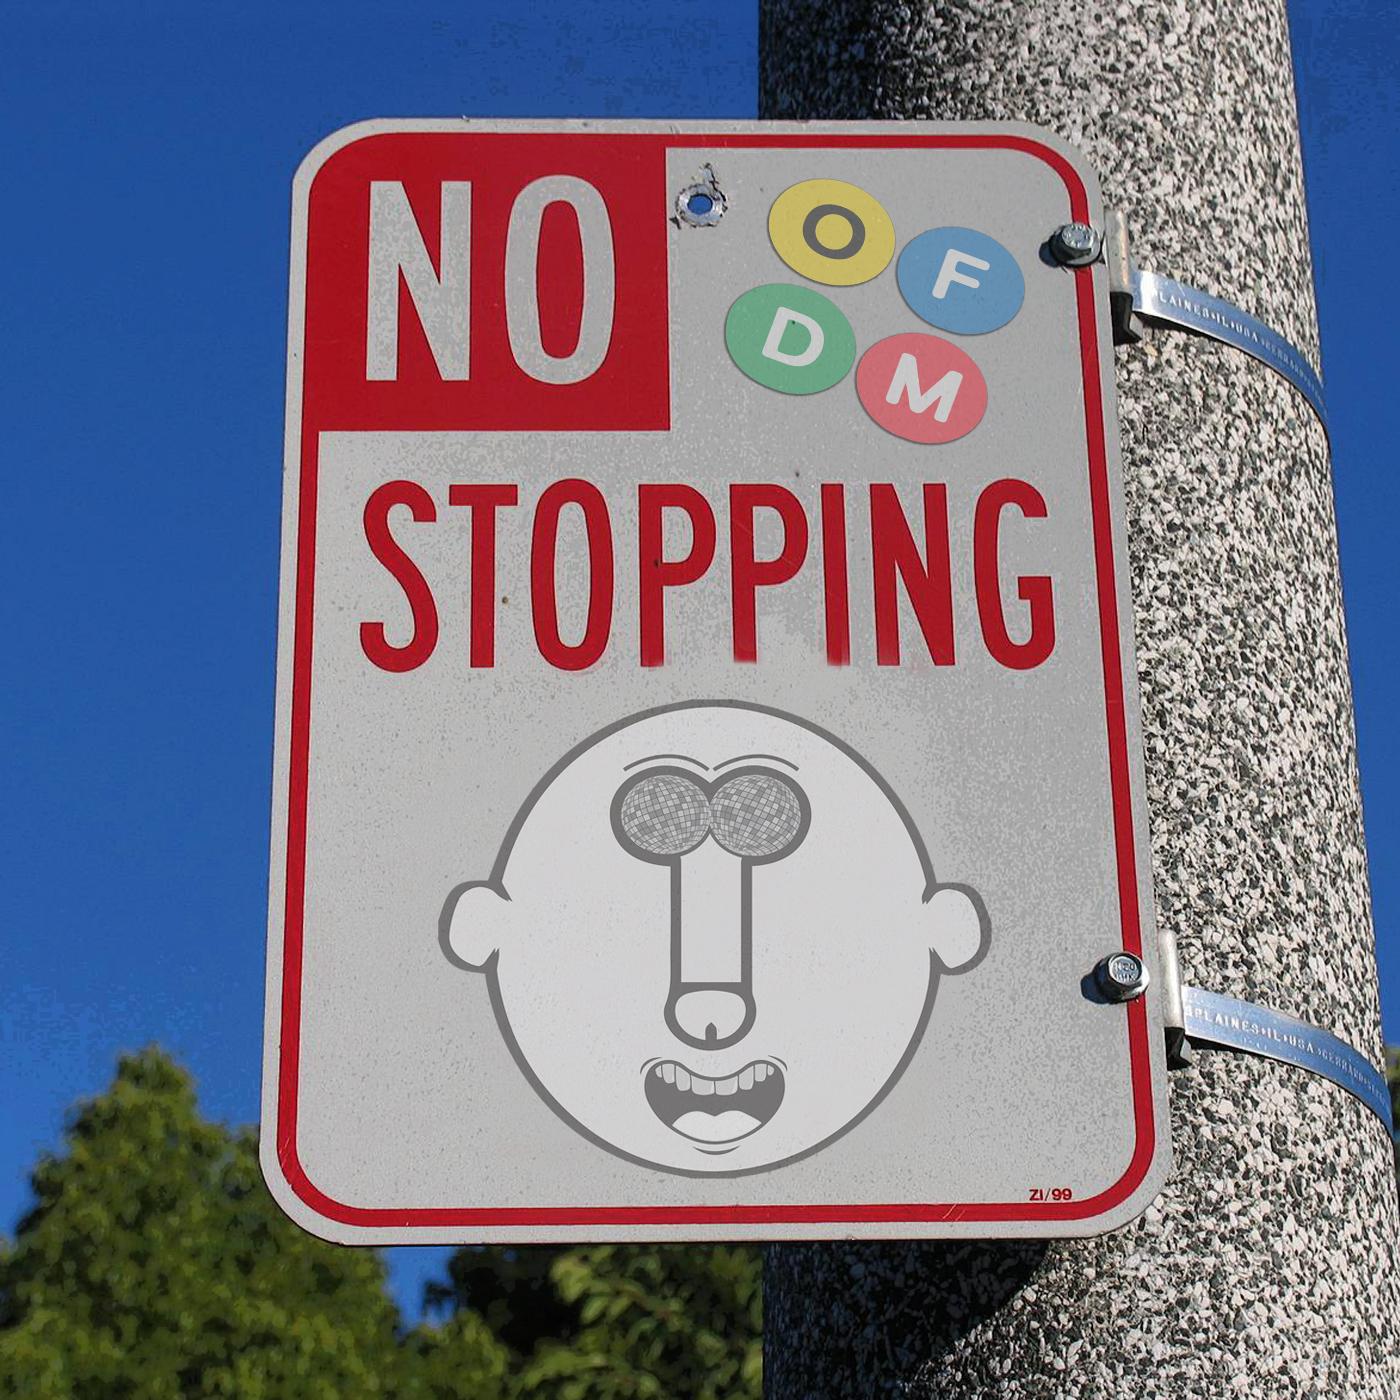 [OFDM006] DISCO DIKC - No Stopping.jpg